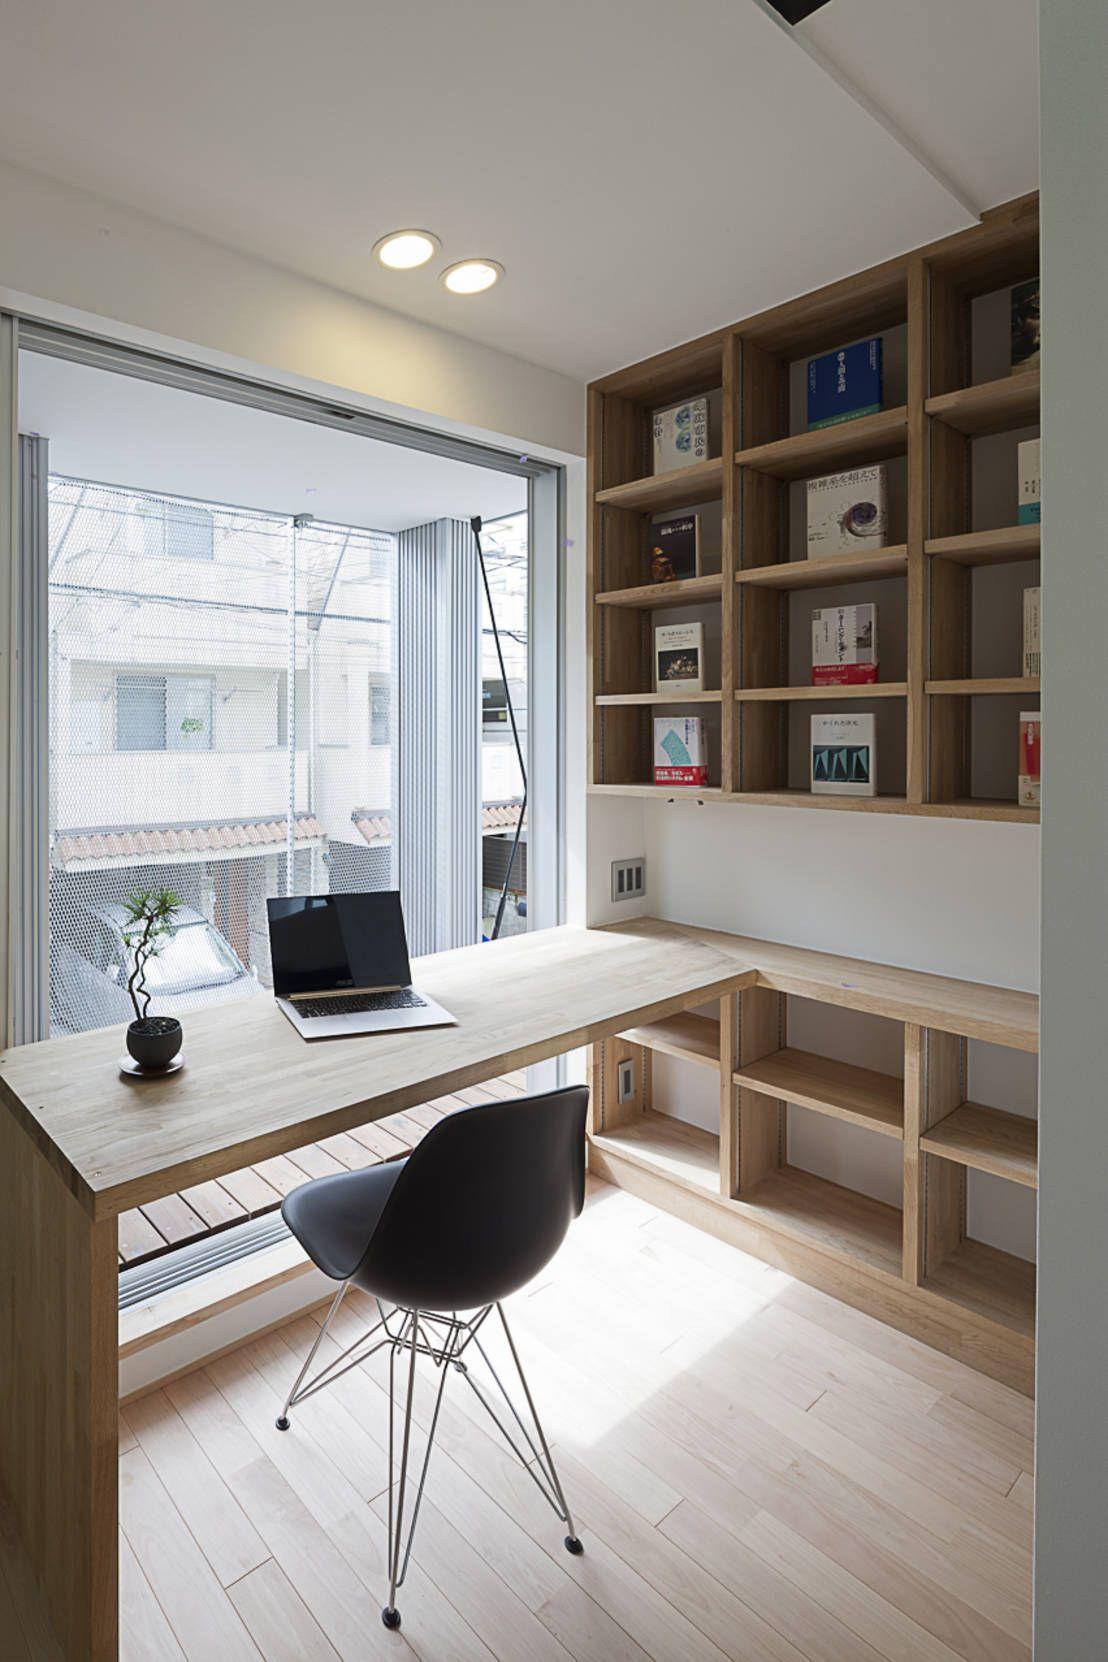 Small 10x10 Study Room Layout: 生産性の高い自宅オフィスを作るためには?